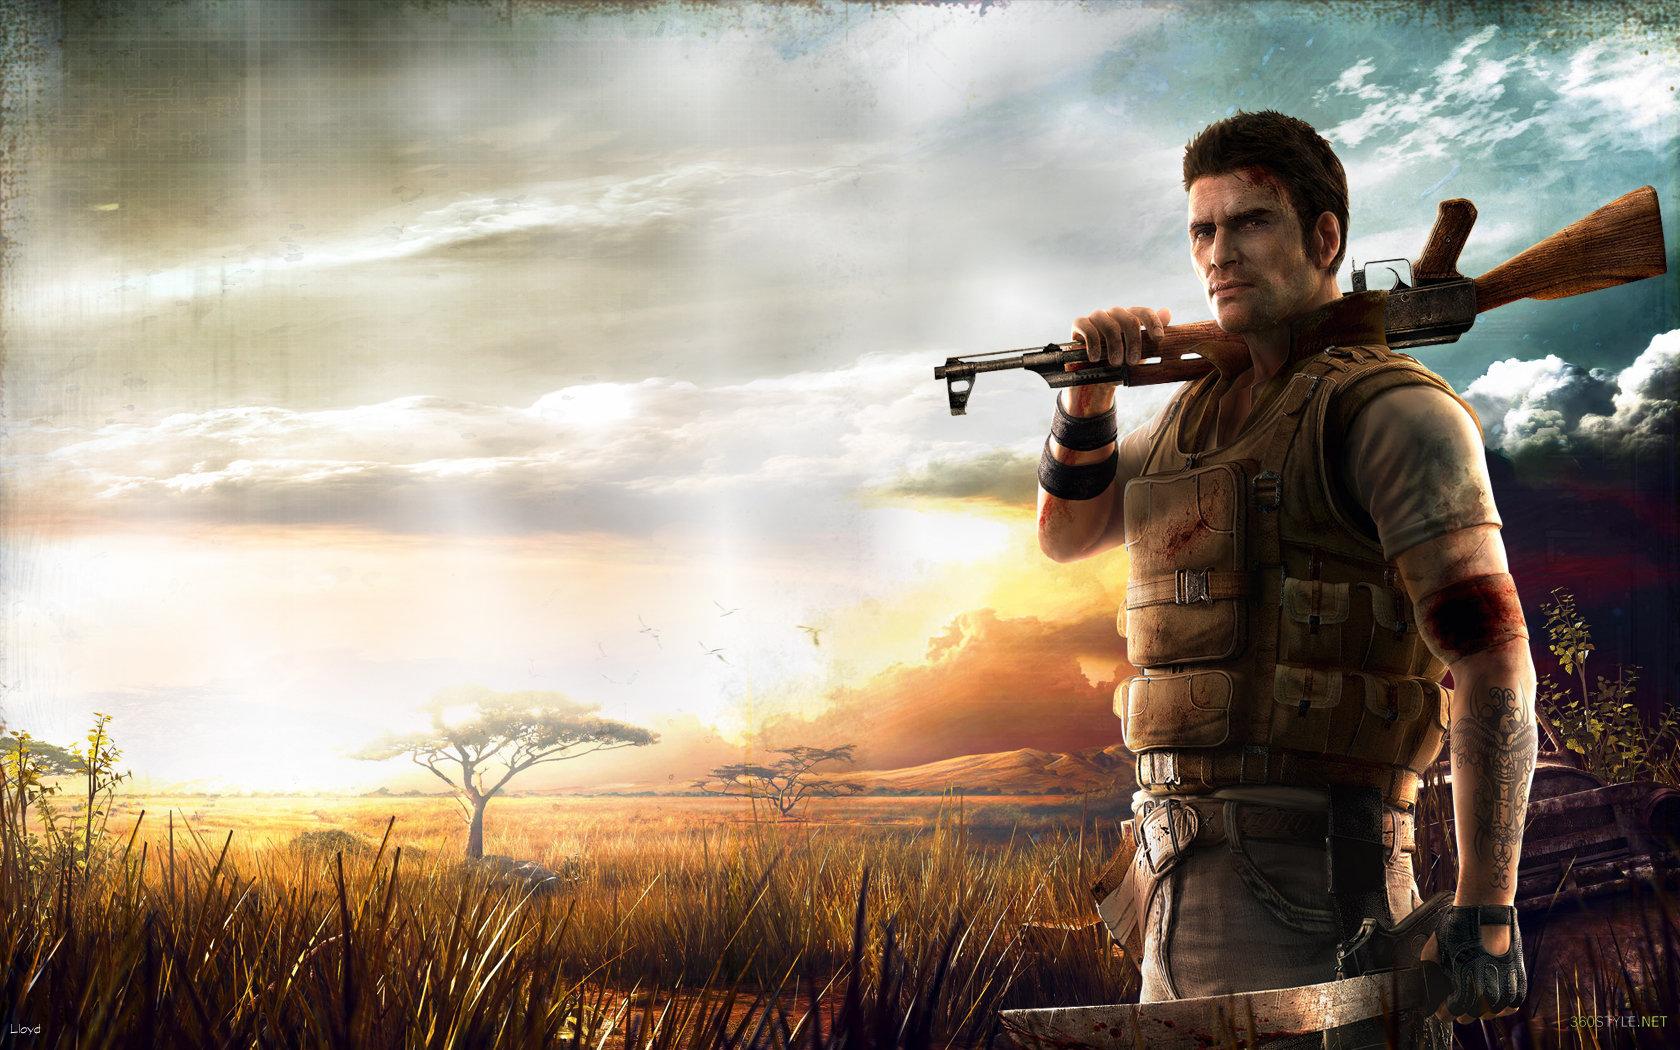 48 Far Cry 2 Wallpaper On Wallpapersafari